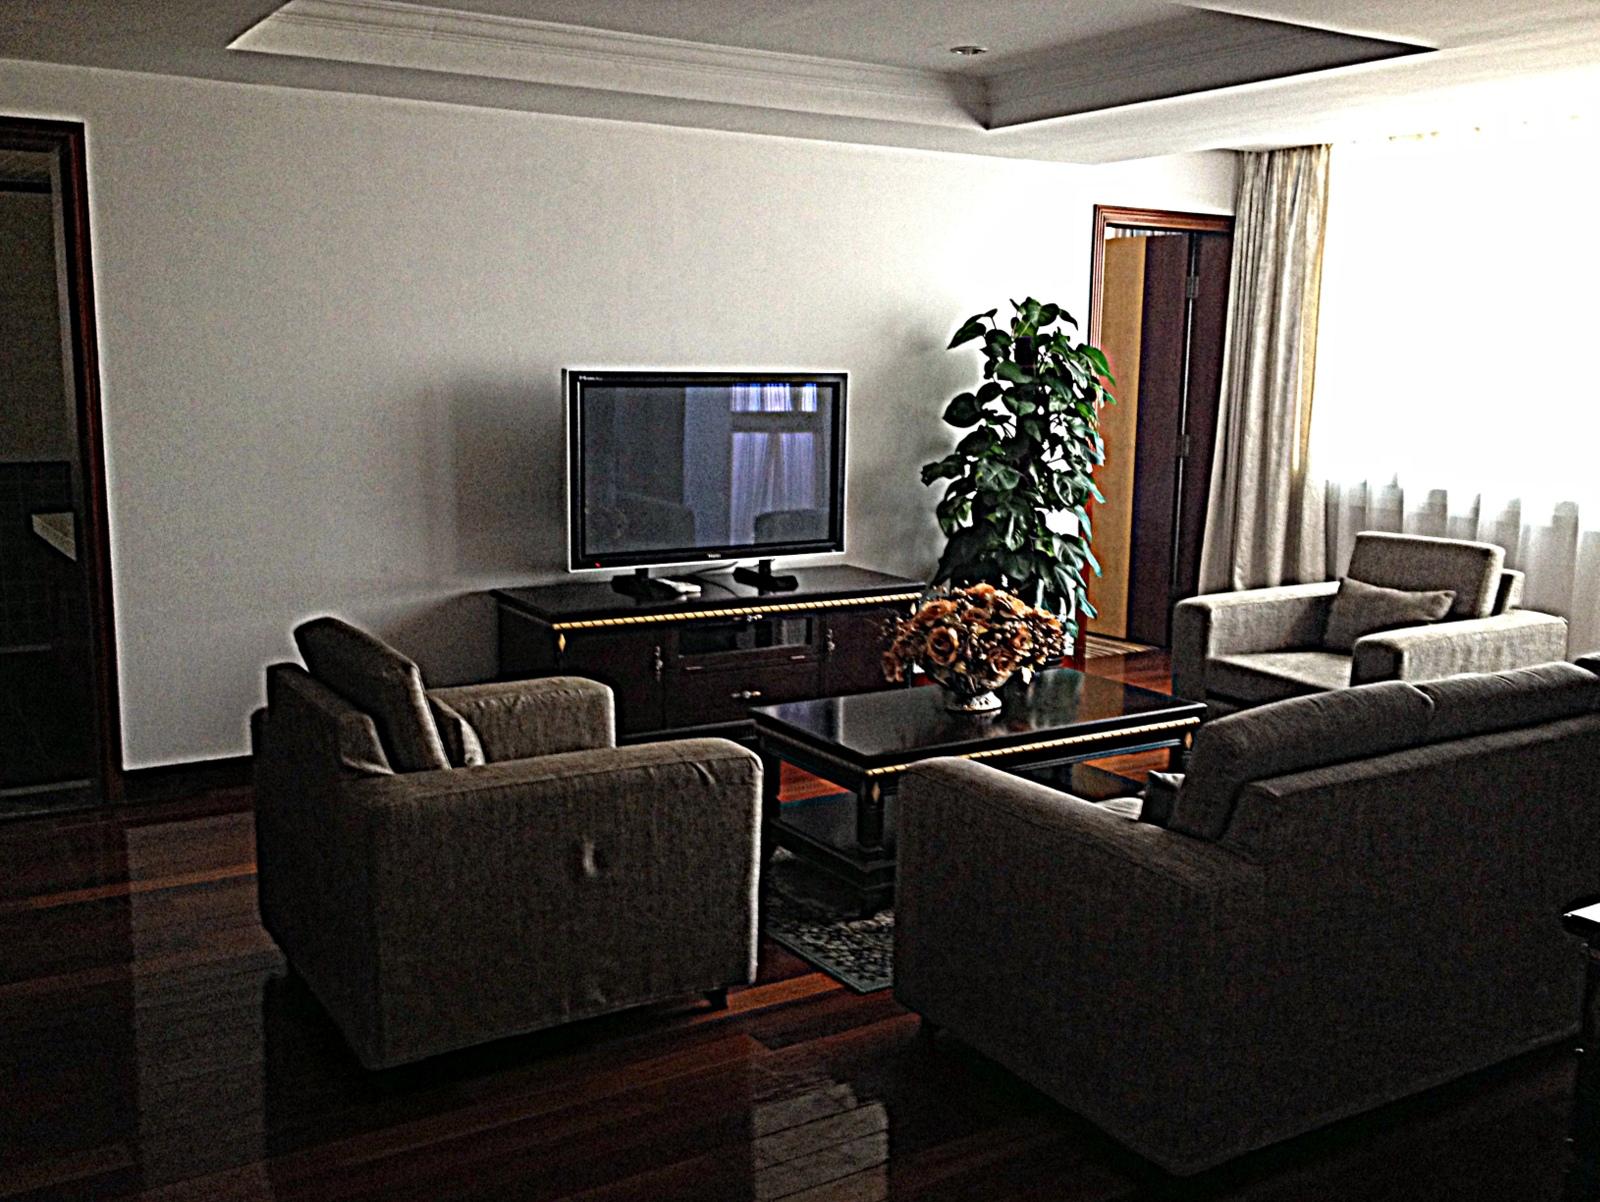 shanghai-shared-apartment-living-room